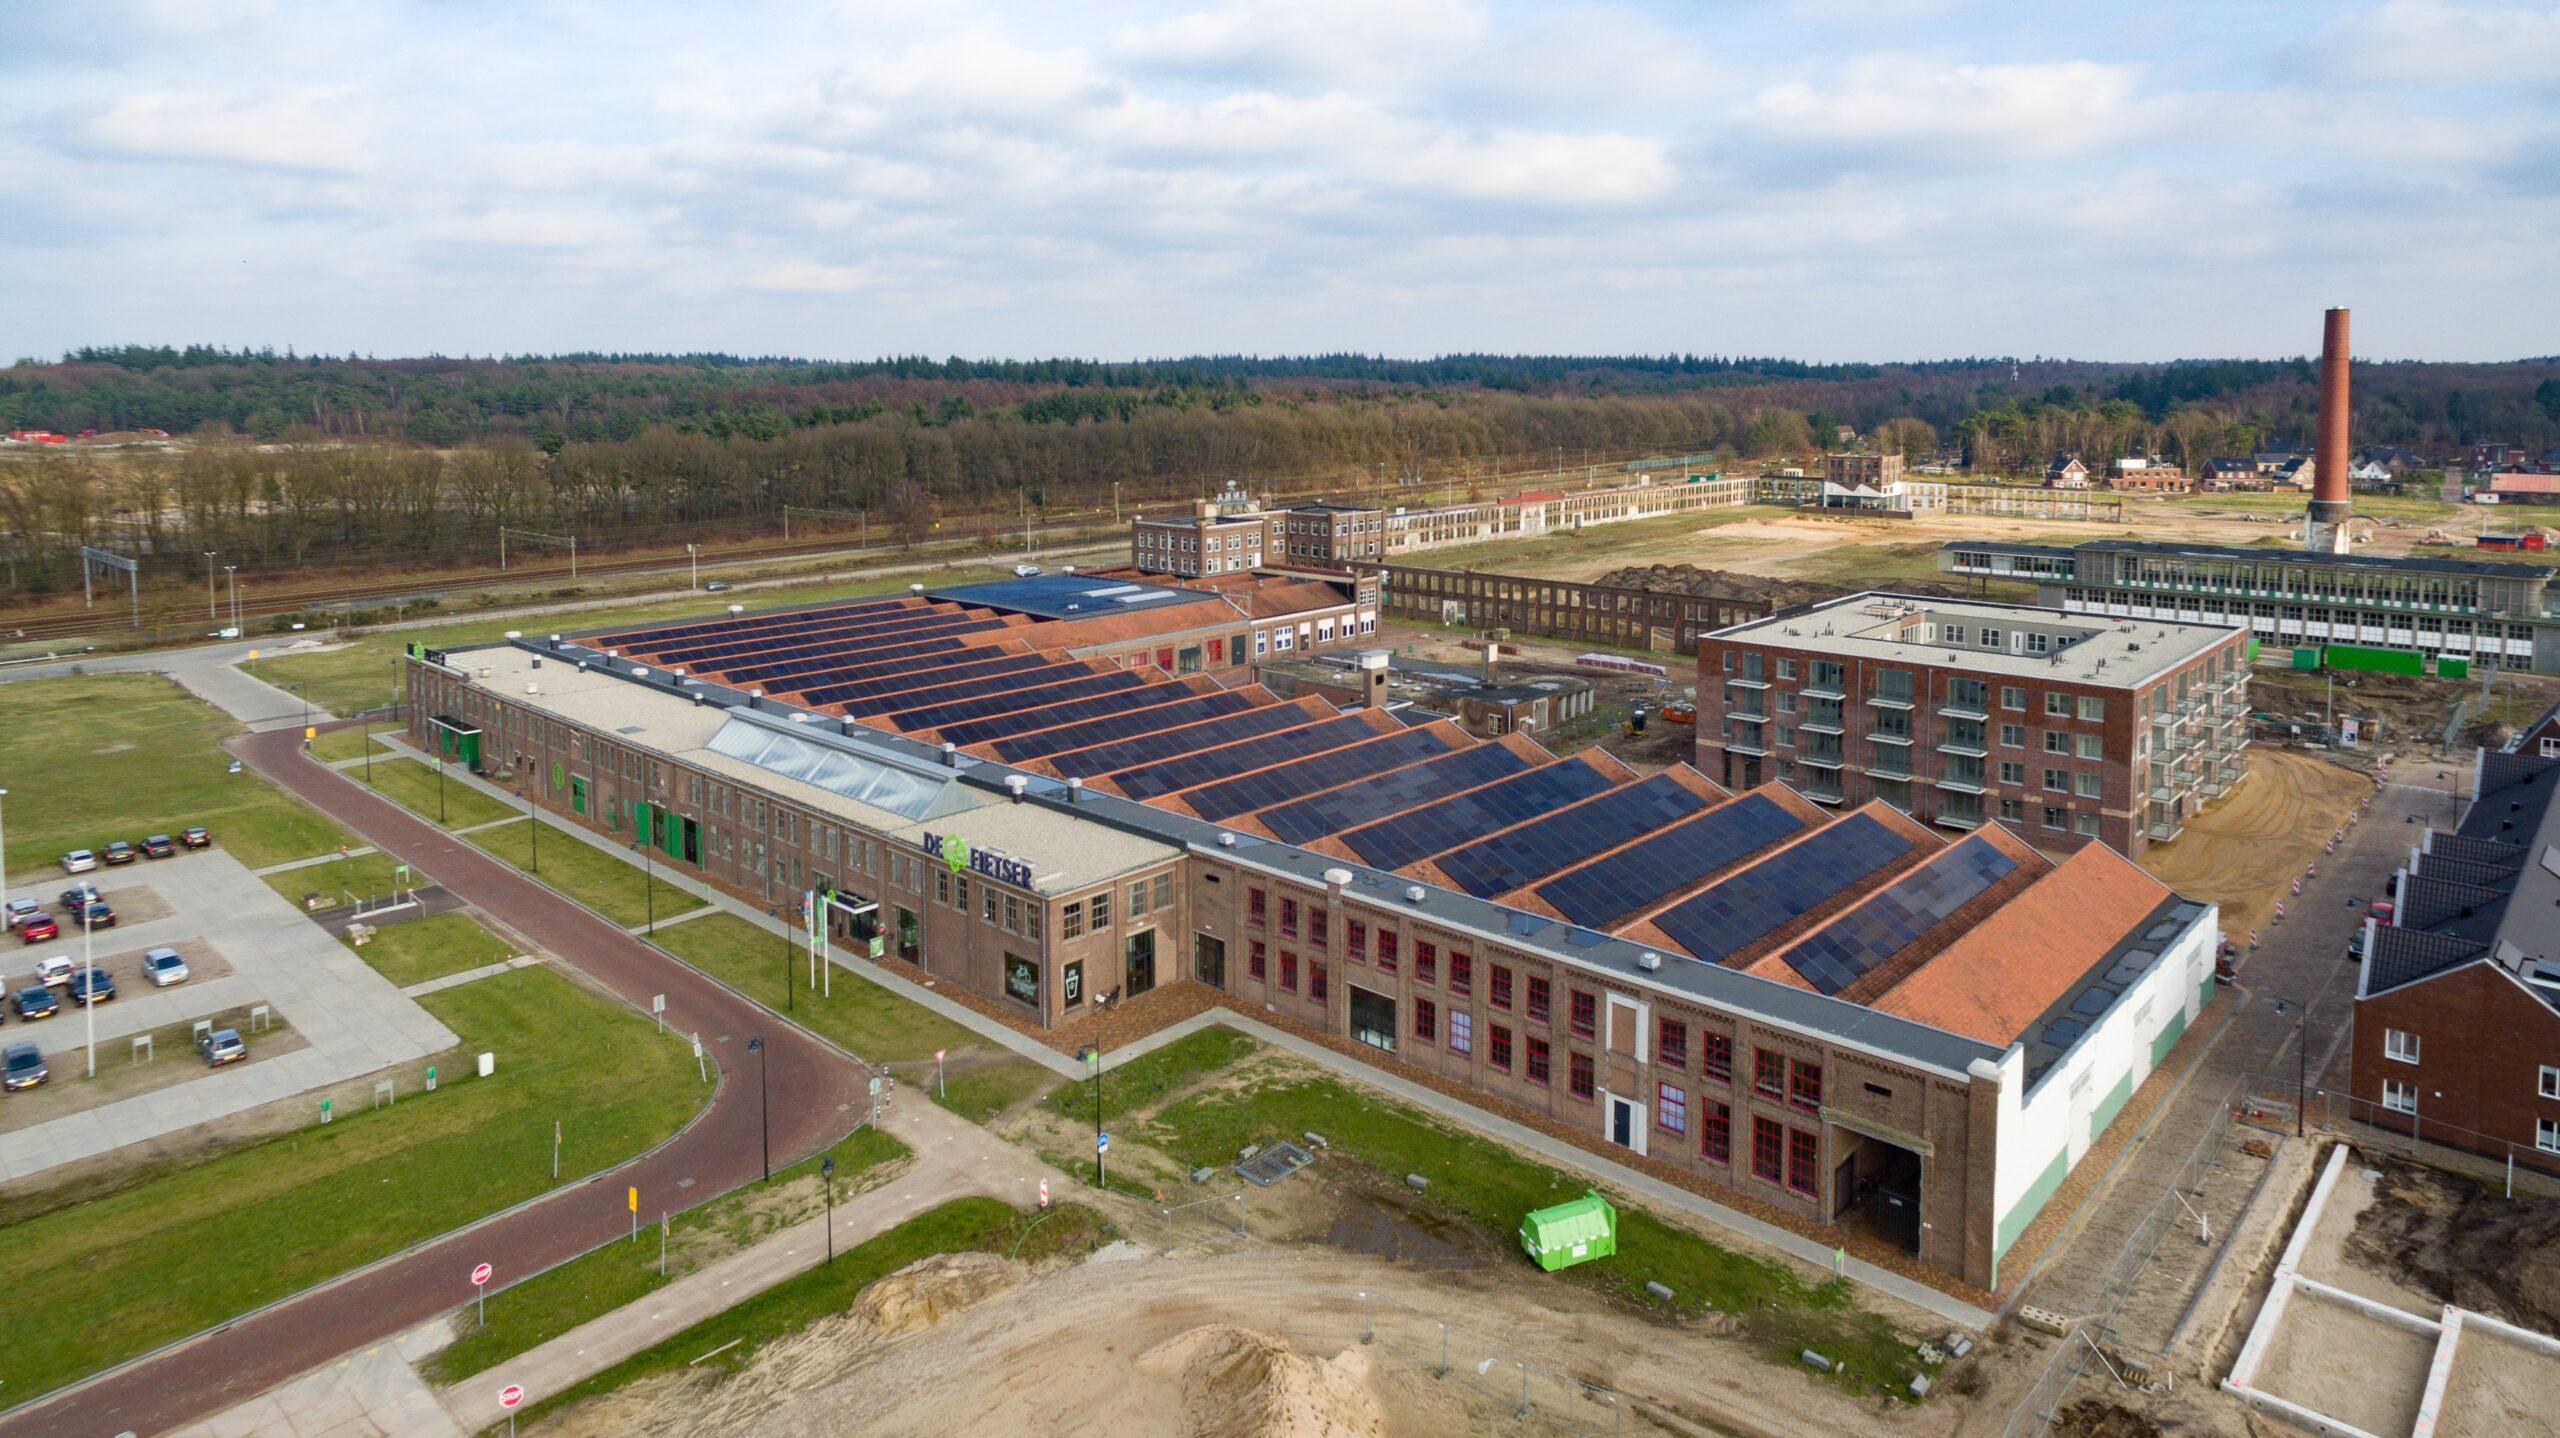 ENKA westhal Zonnepanelen duurzaamheid